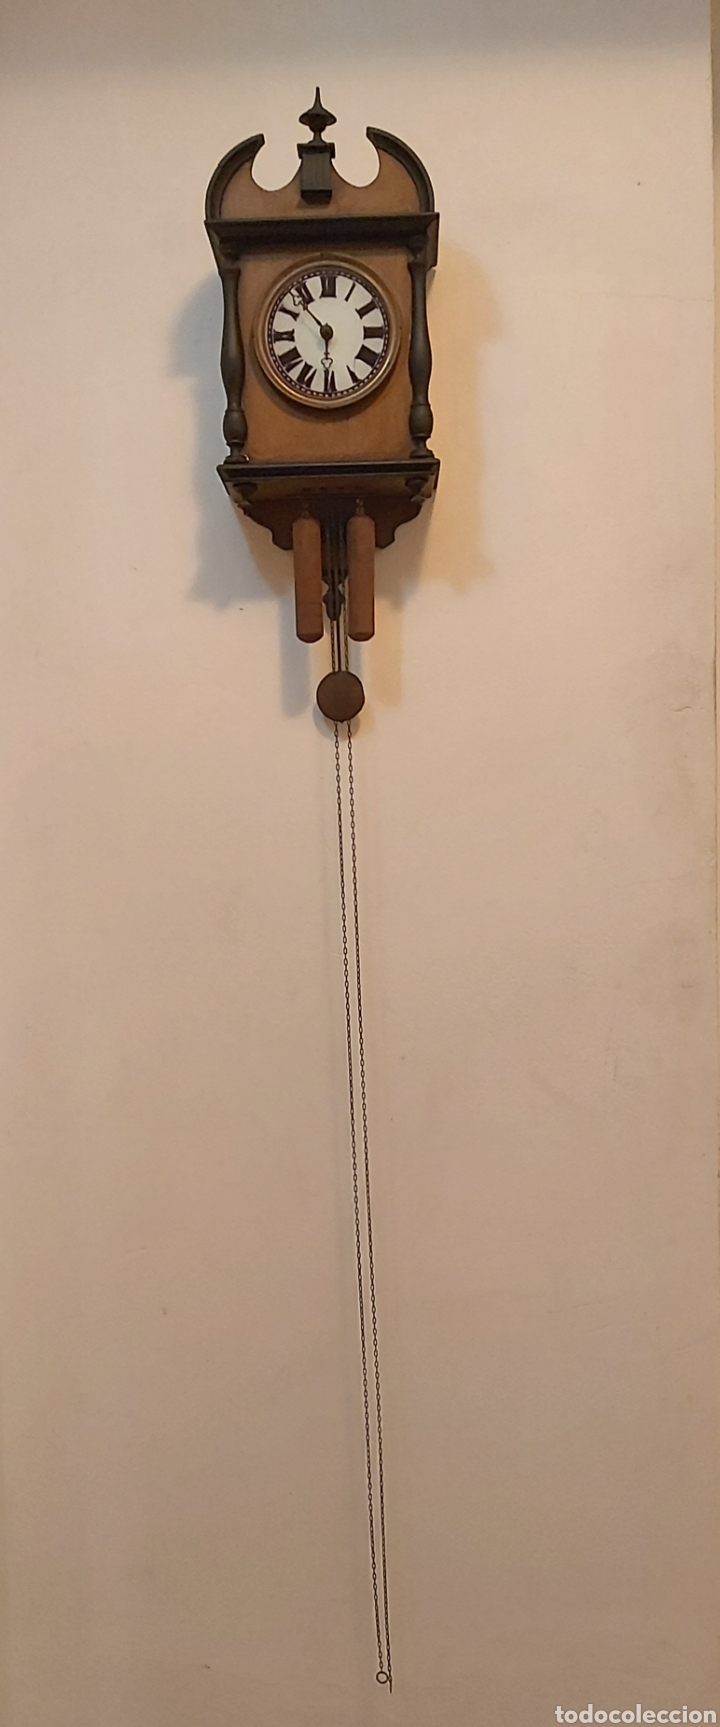 Relojes de pared: RELOJ DE PARED CON PÉNDULO S.XIX - Foto 2 - 192678116